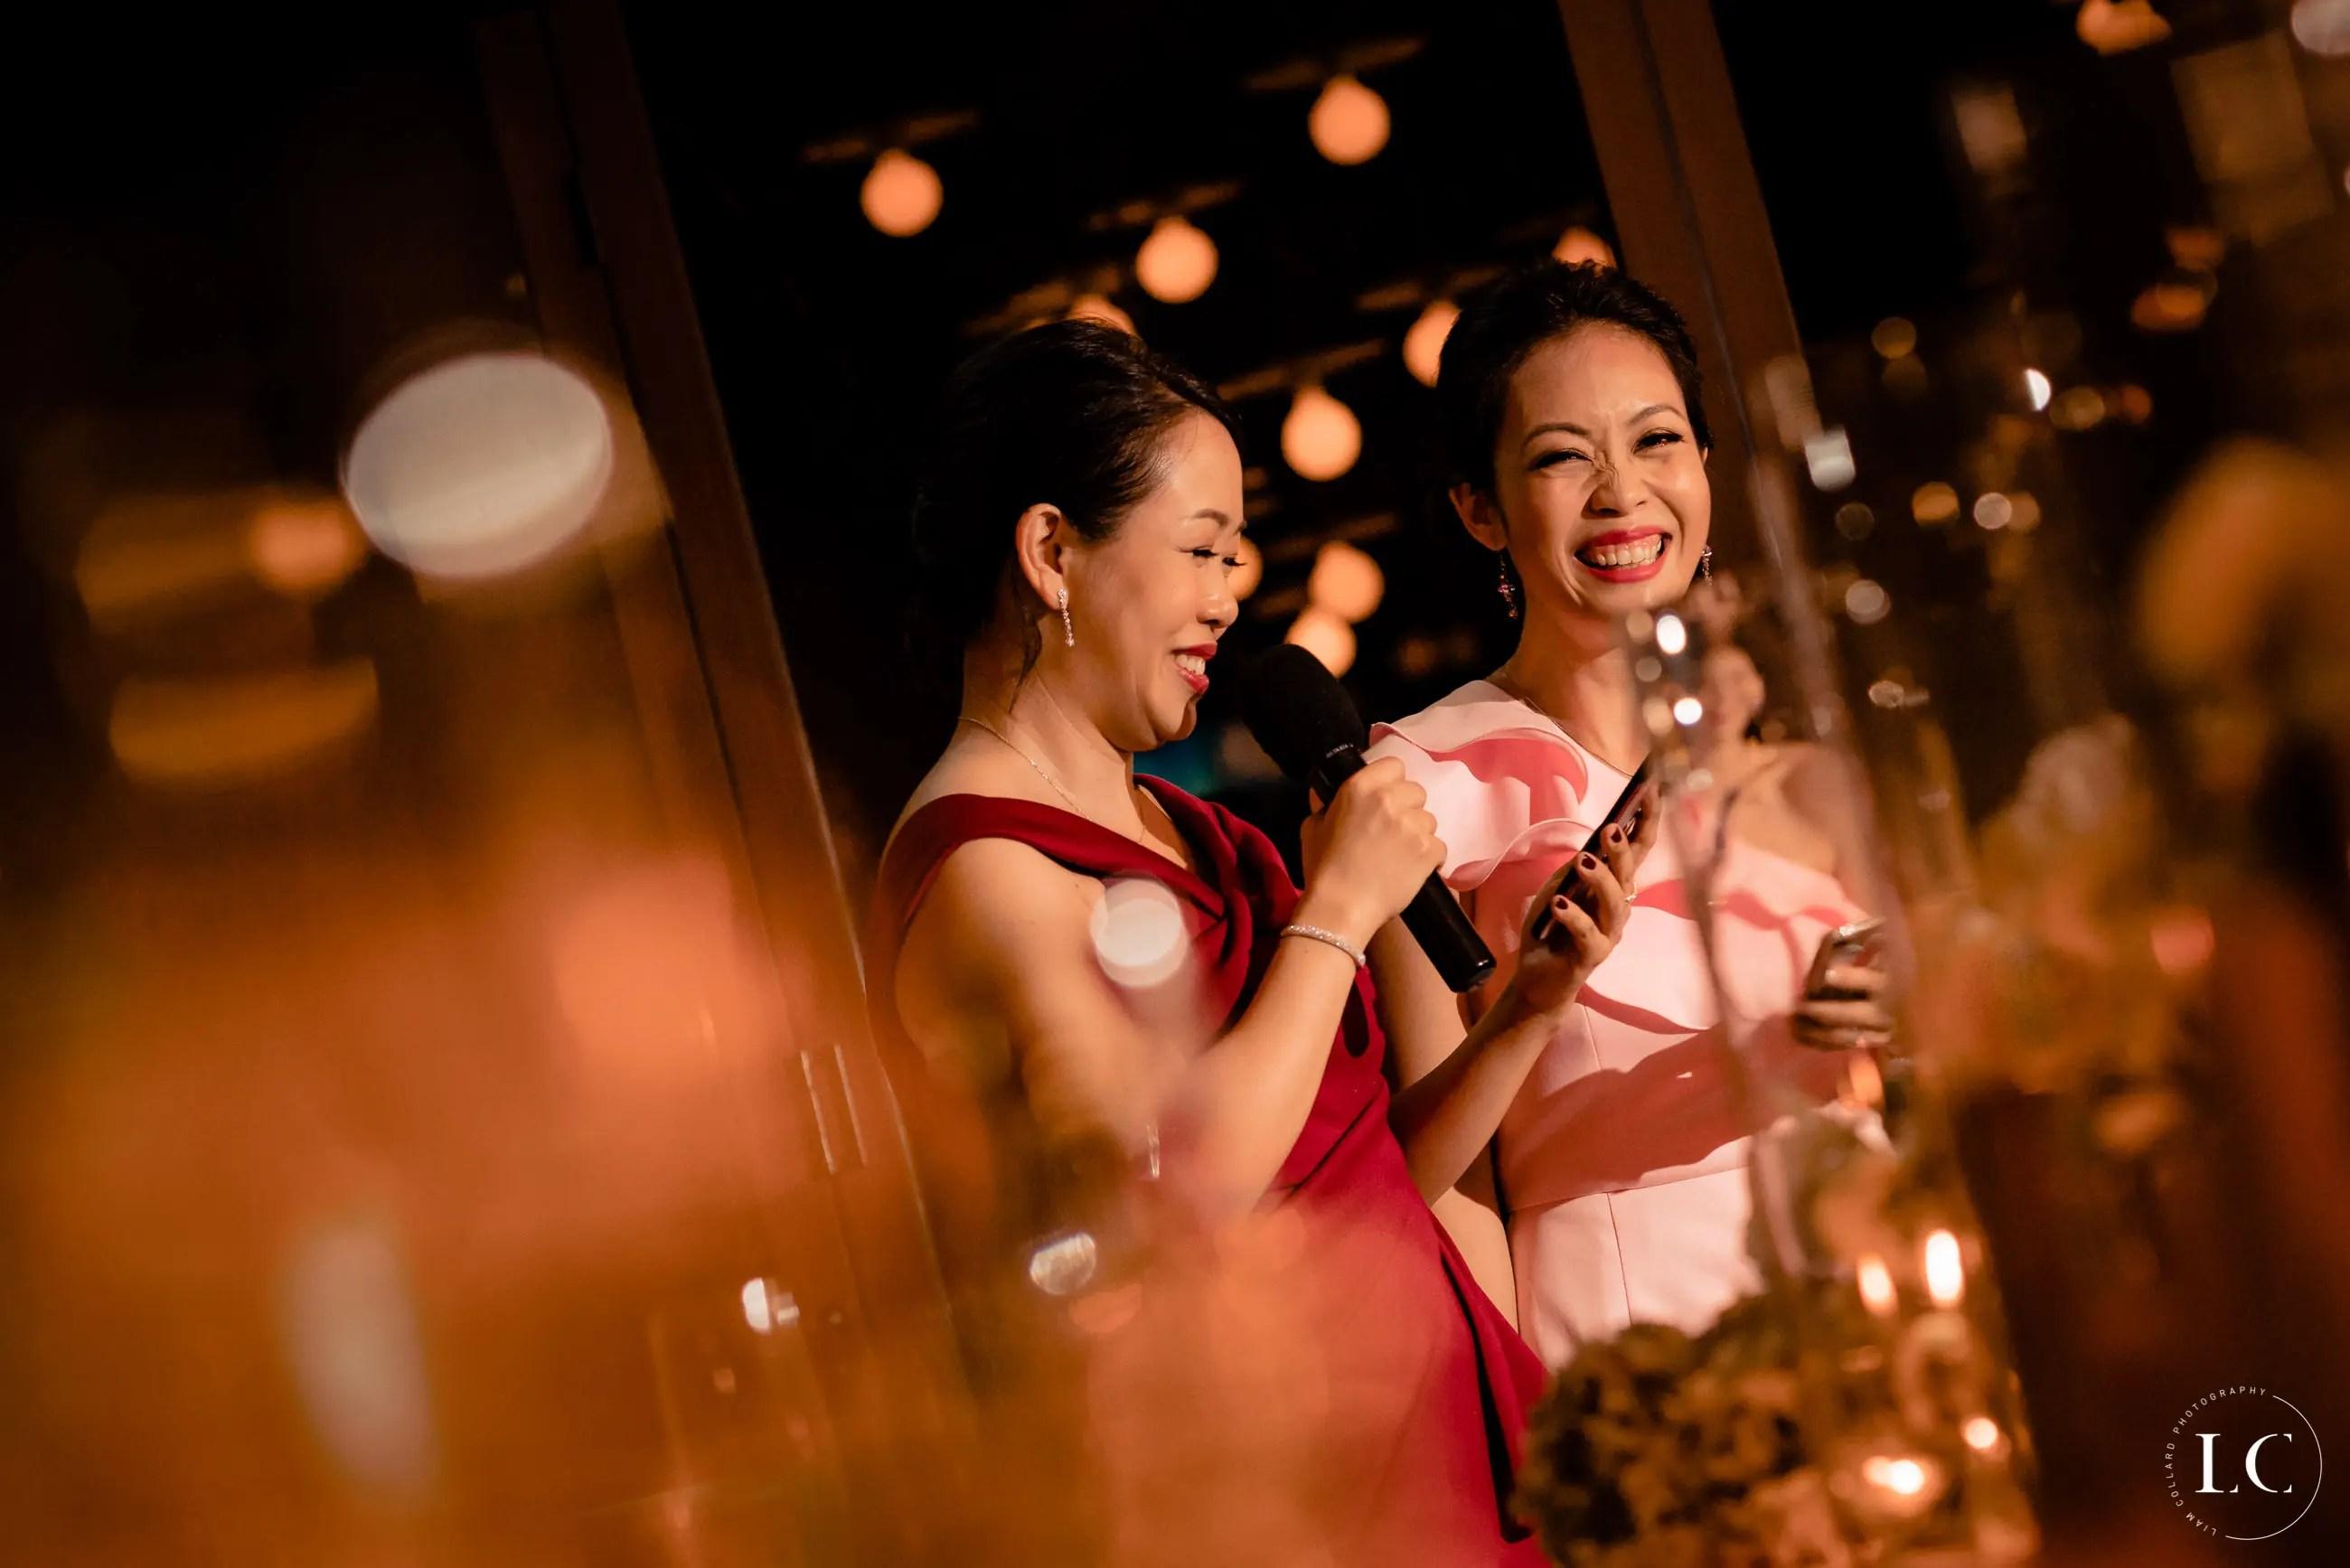 Girls smiling at wedding reception